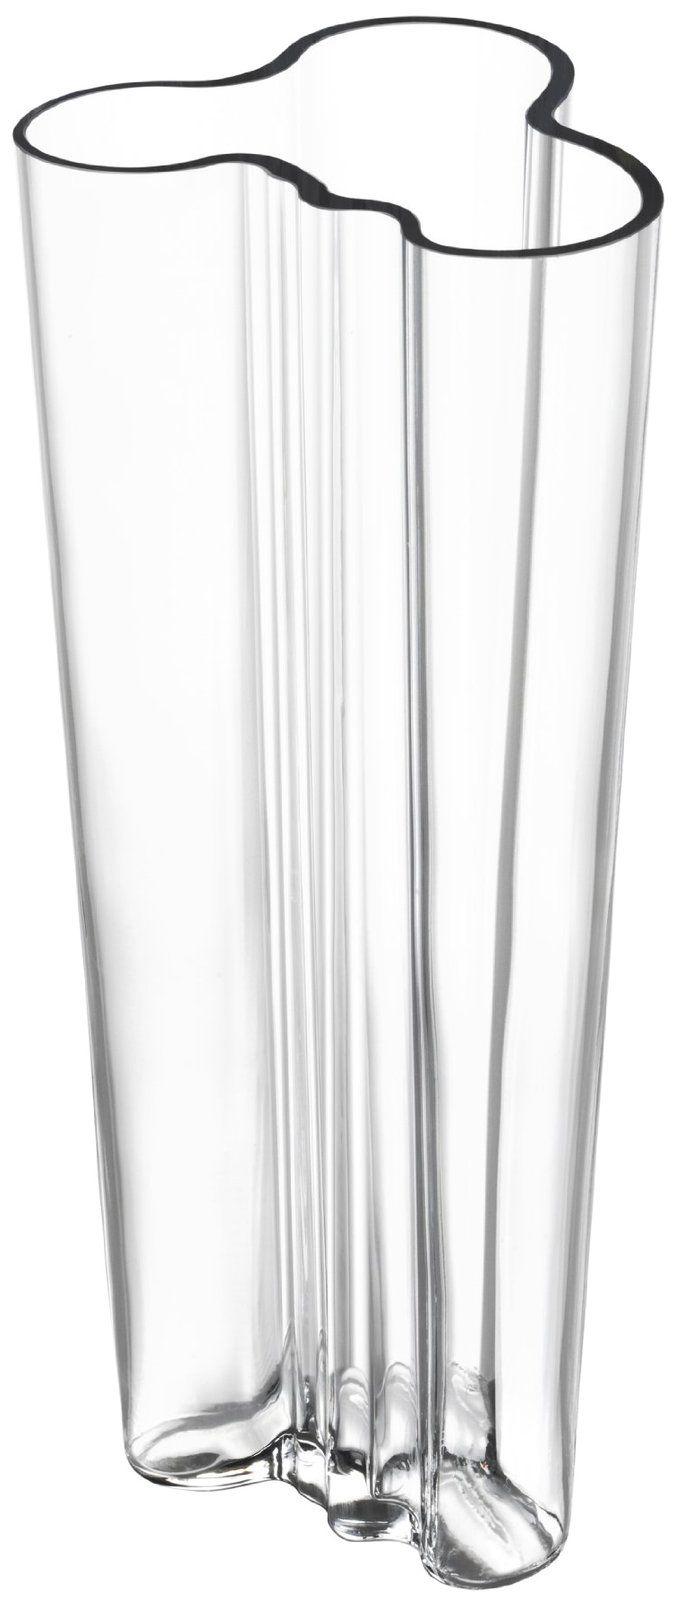 iittala Alvar Aalto Finlandia Vase, Clear | Free Shipping